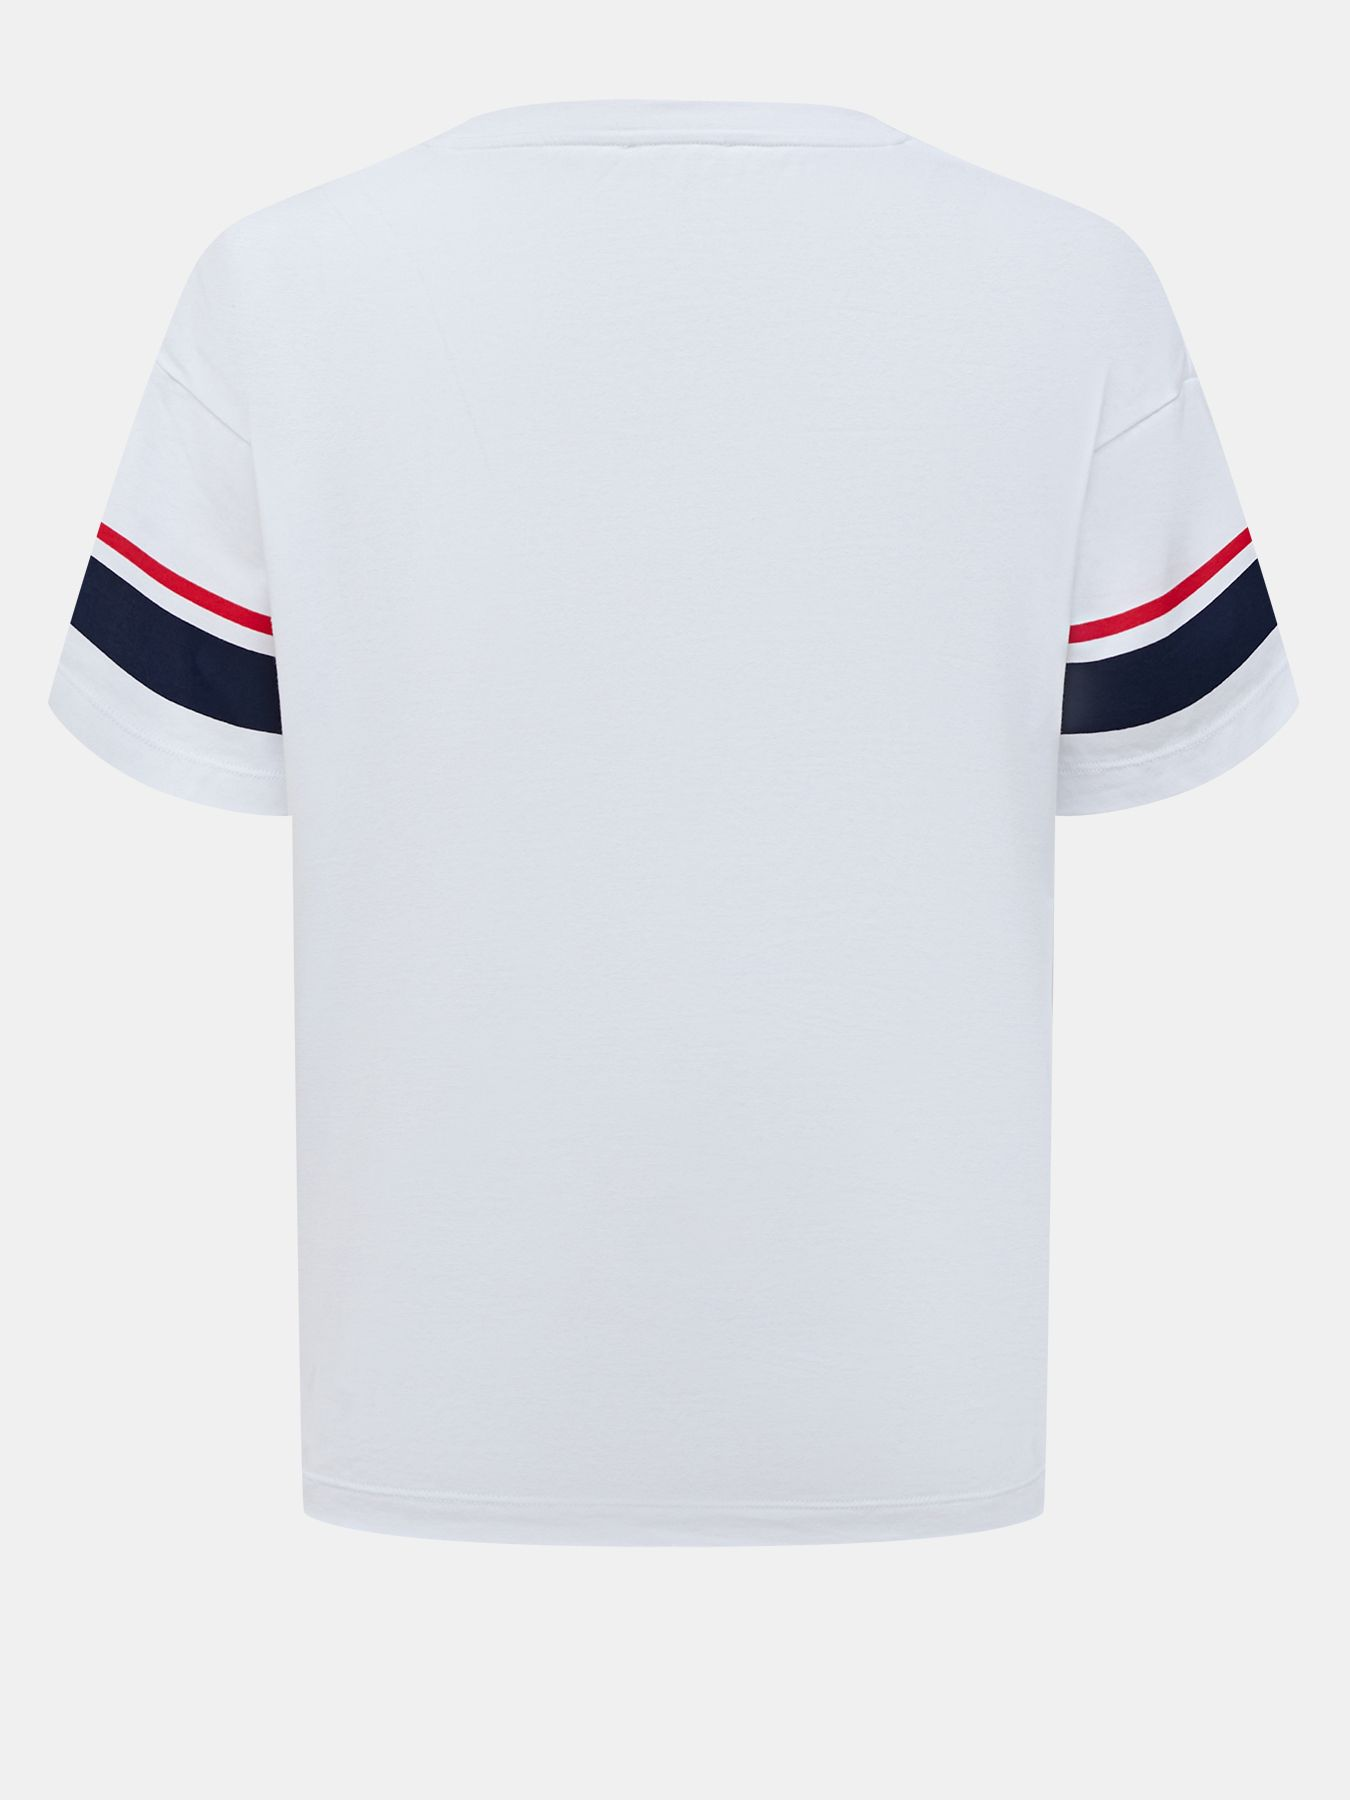 Фуфайка (футболка) ORSA Orange Футболка